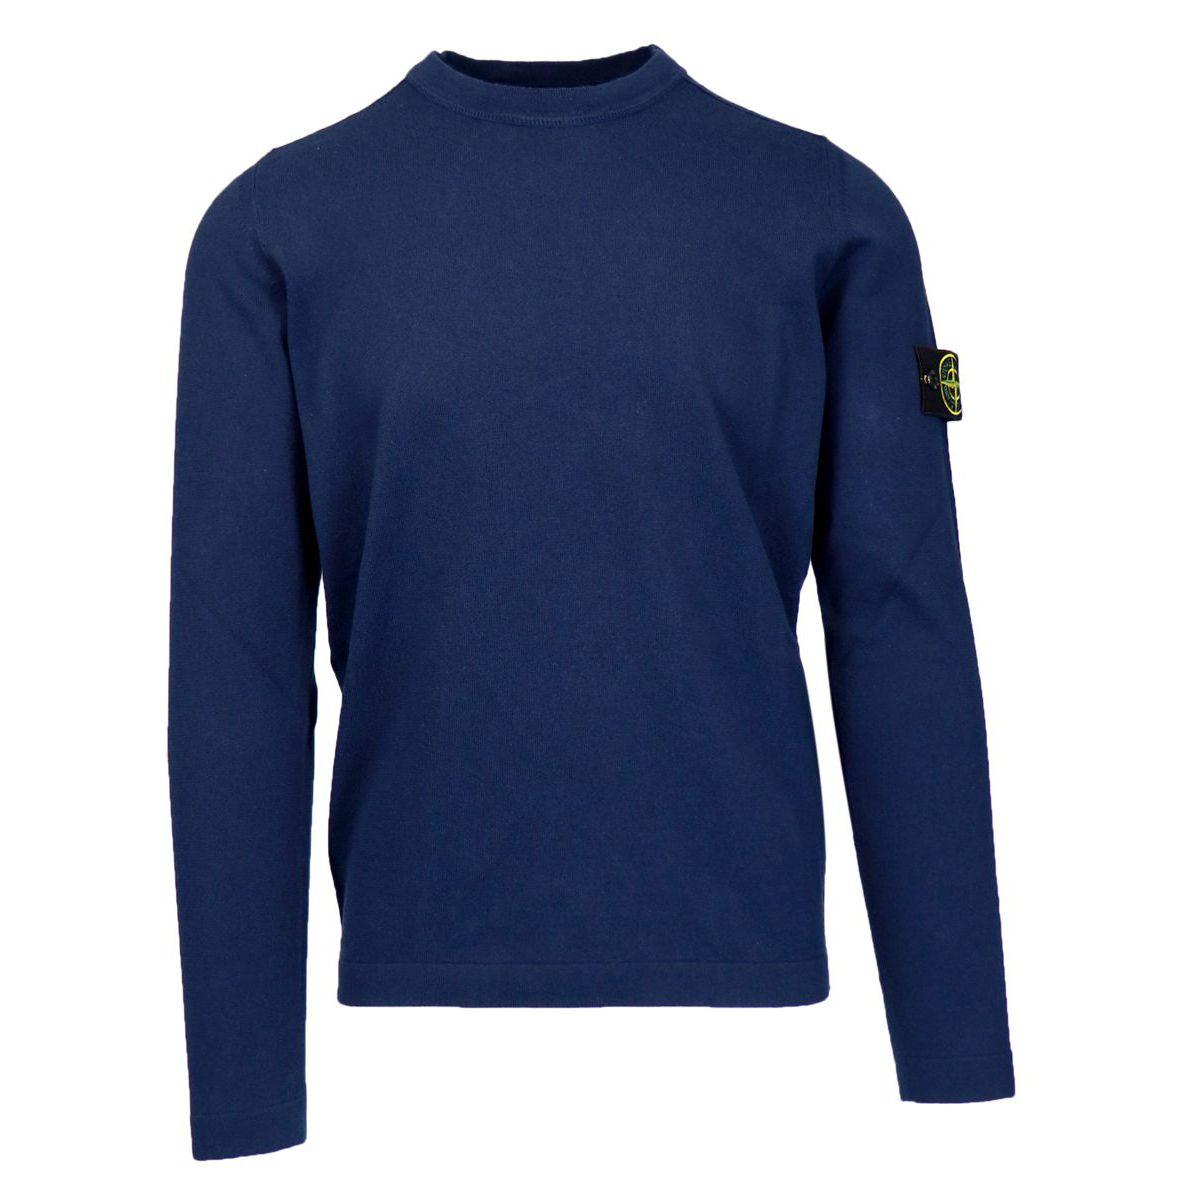 Crew neck cotton sweater with logo patch Marine blue Stone Island